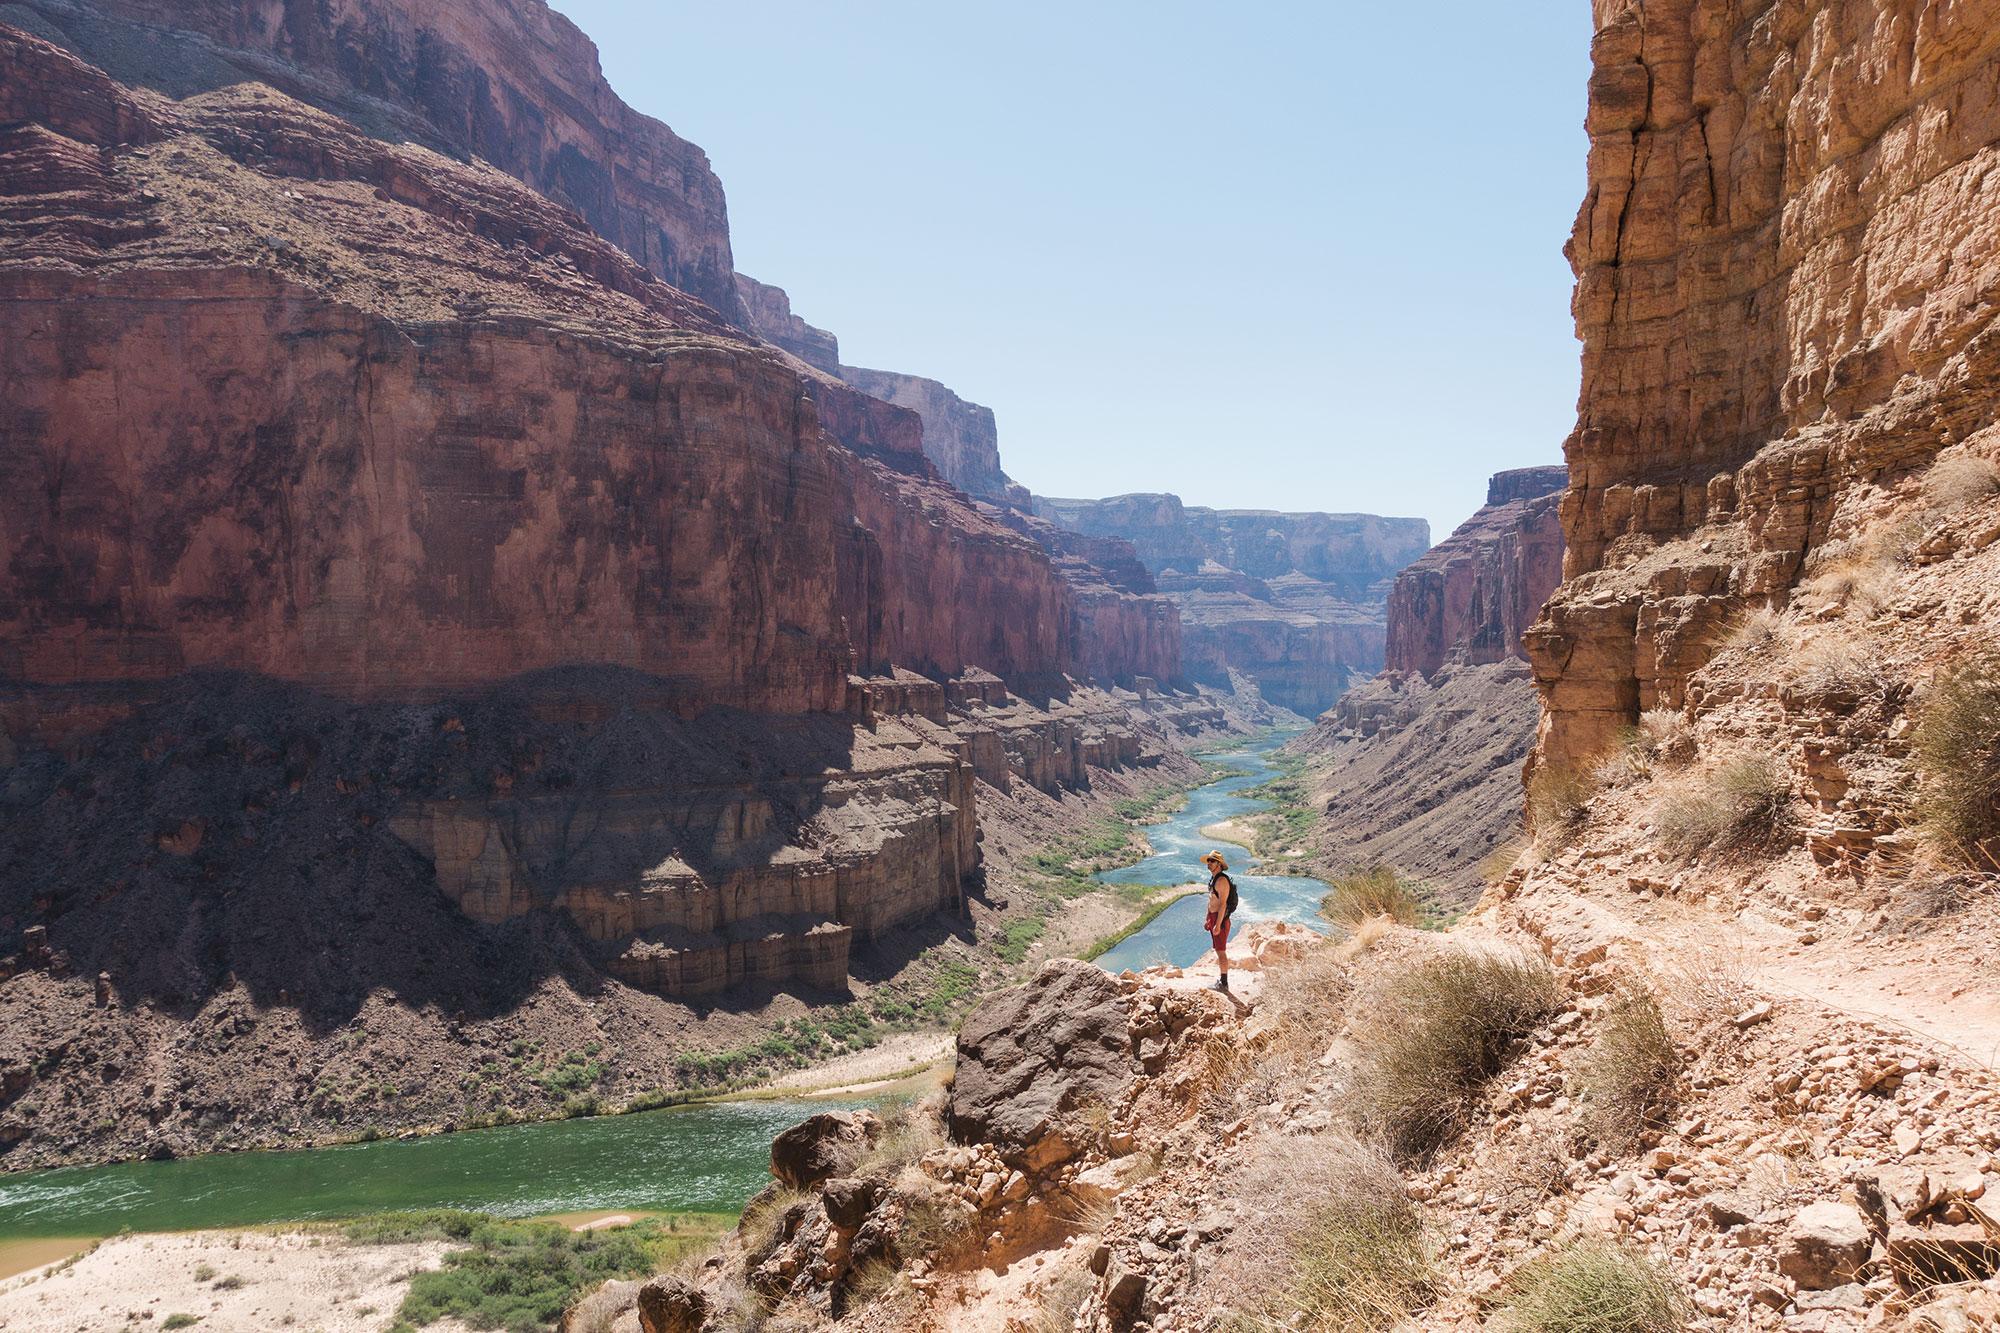 Apres Noon Grand Canyon Colorado River